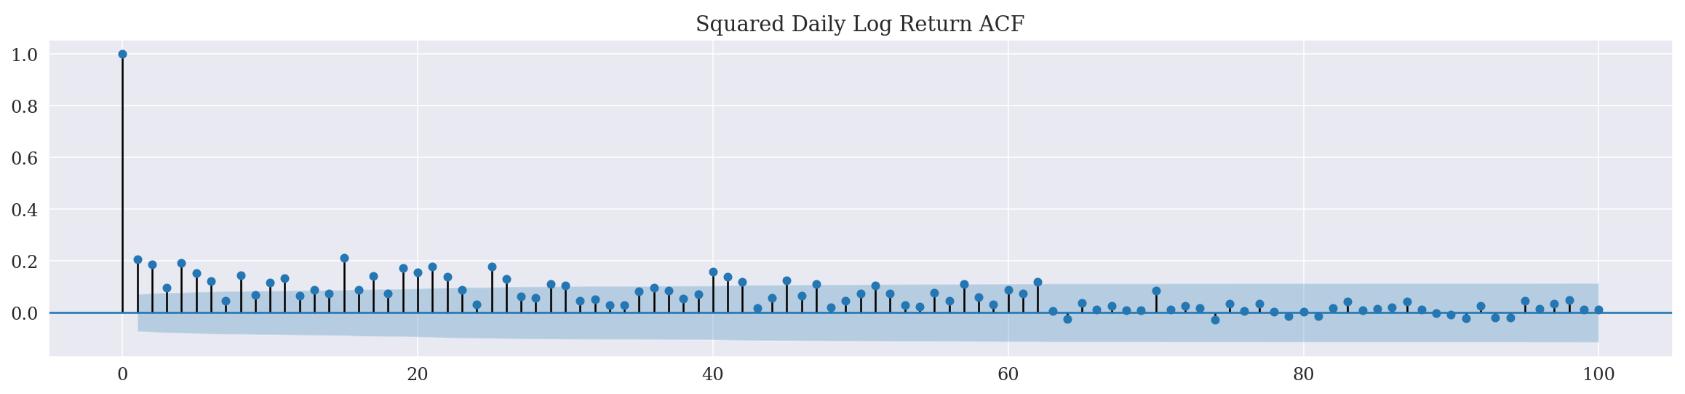 squared_daily_log_return_acf.png